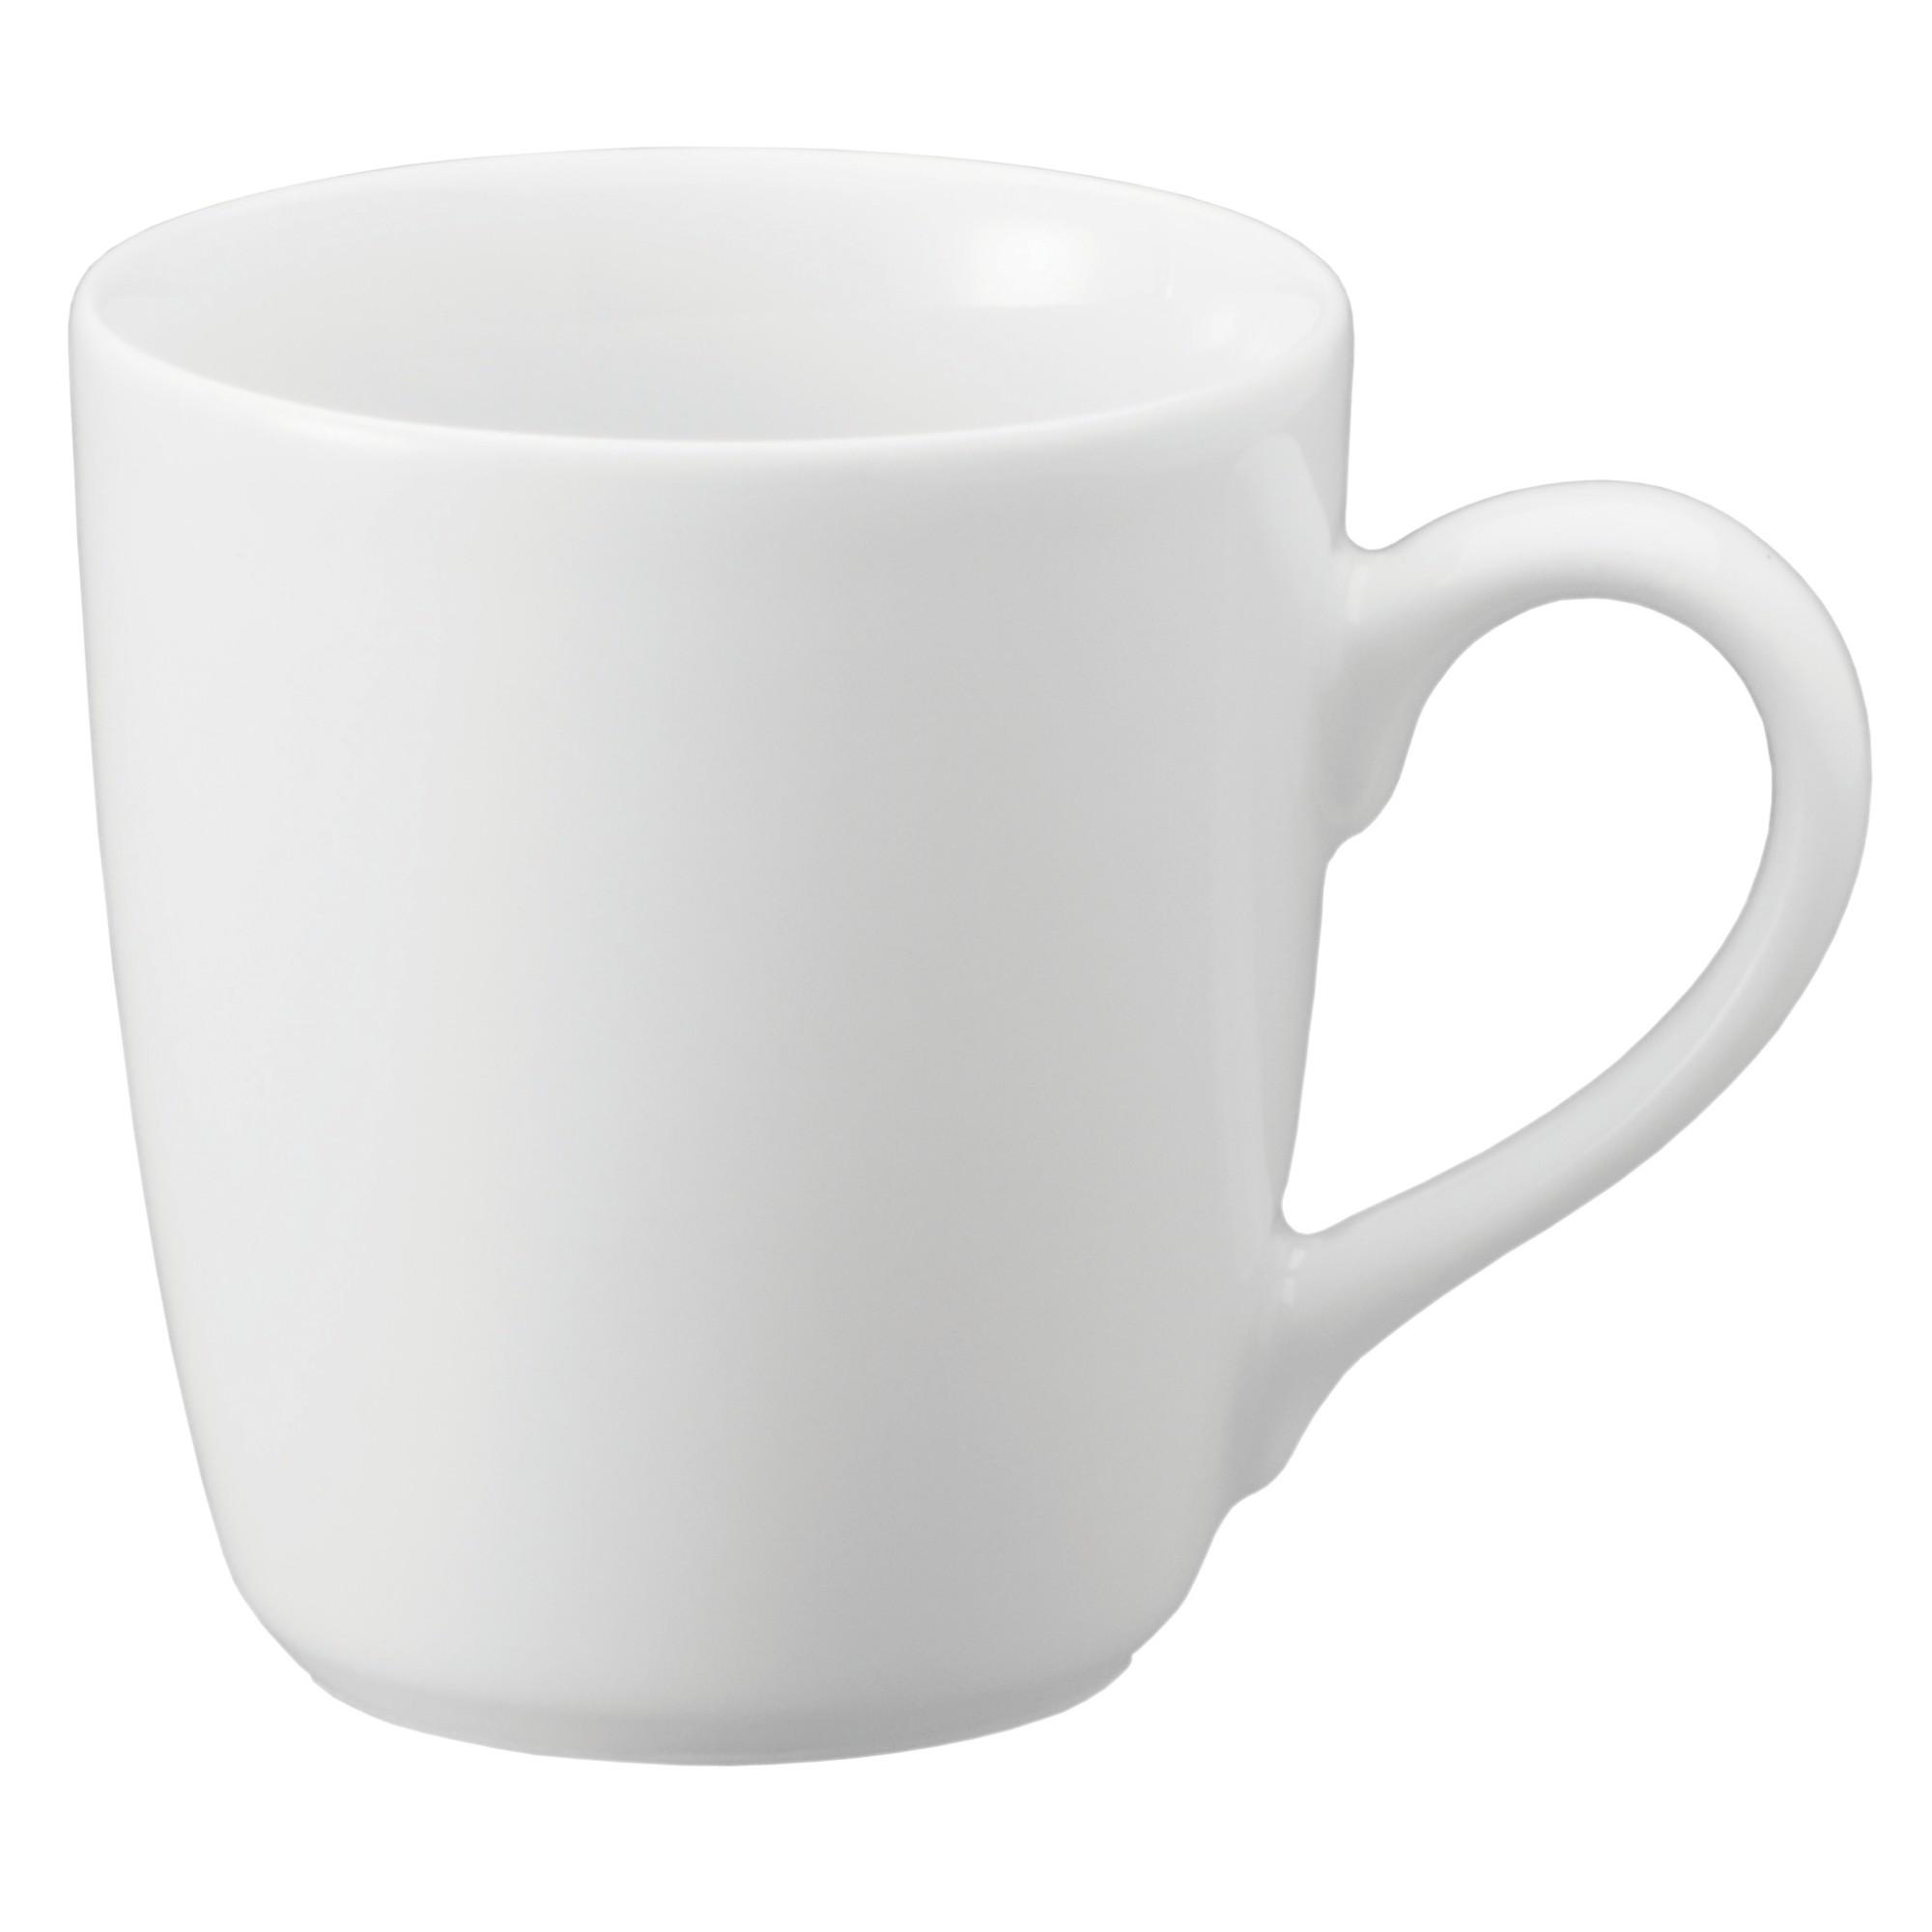 Caneca de Porcelana 225ml Branca - Schmidt